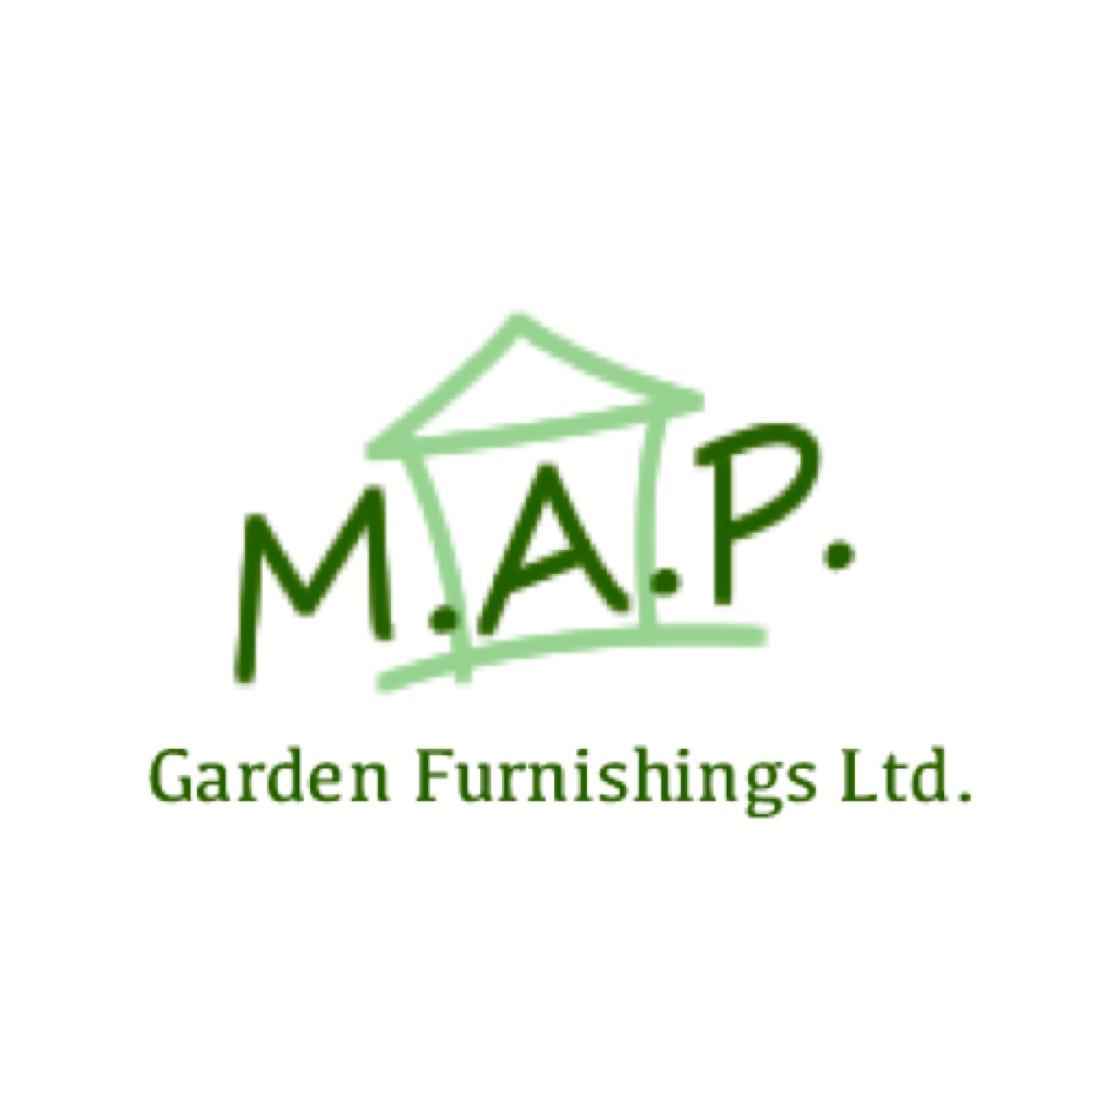 Shire Abbeyford Pine Lodge 70mm